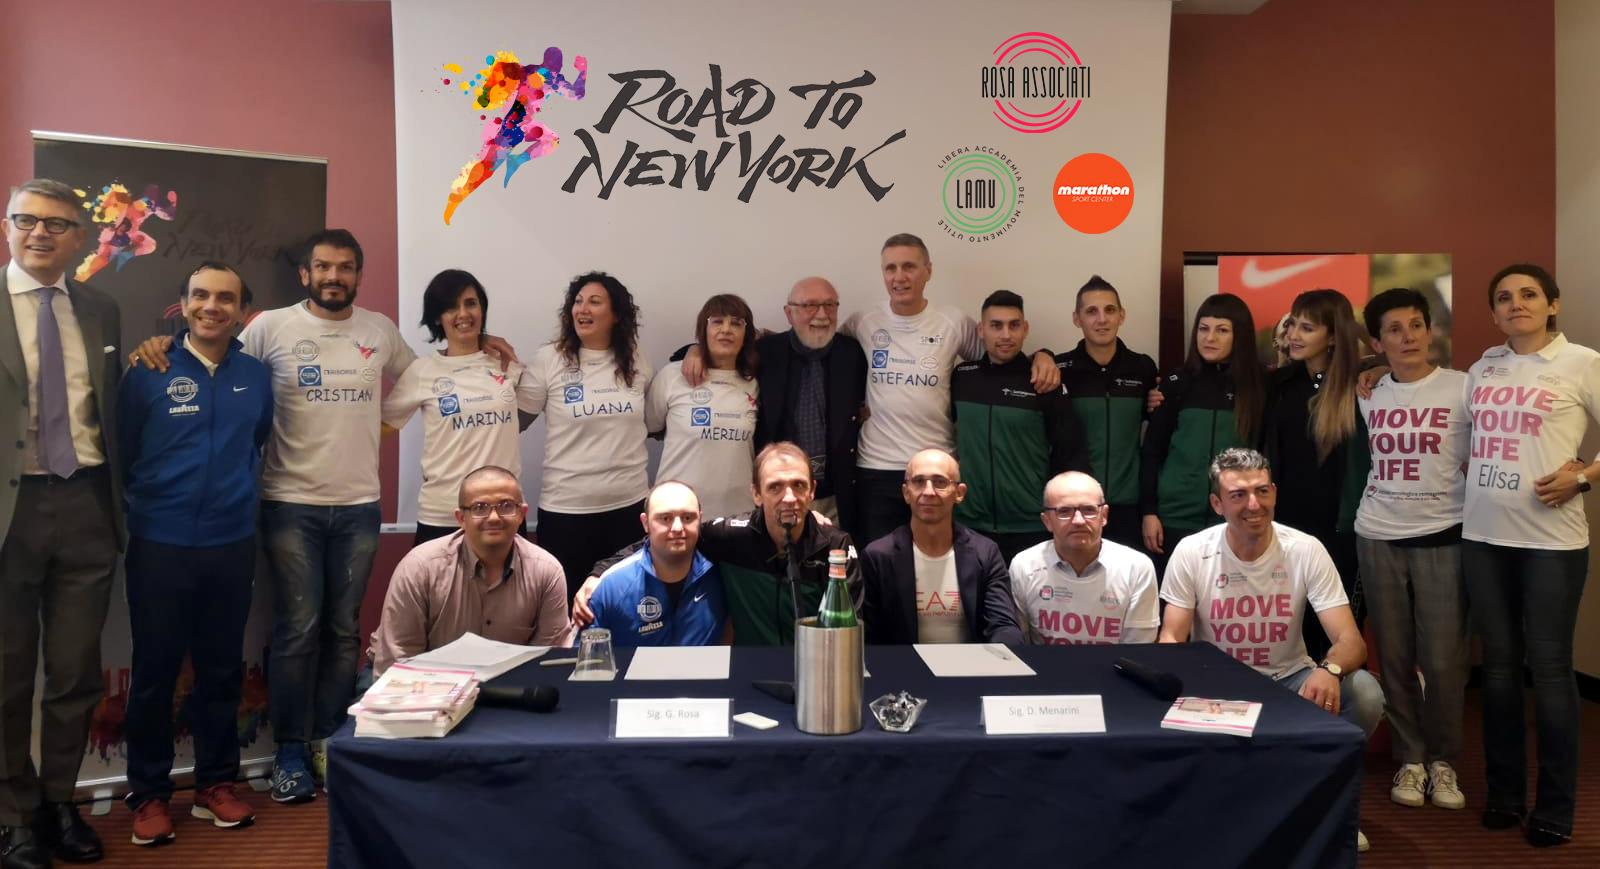 rosa-associati-road-to-new-york-2019